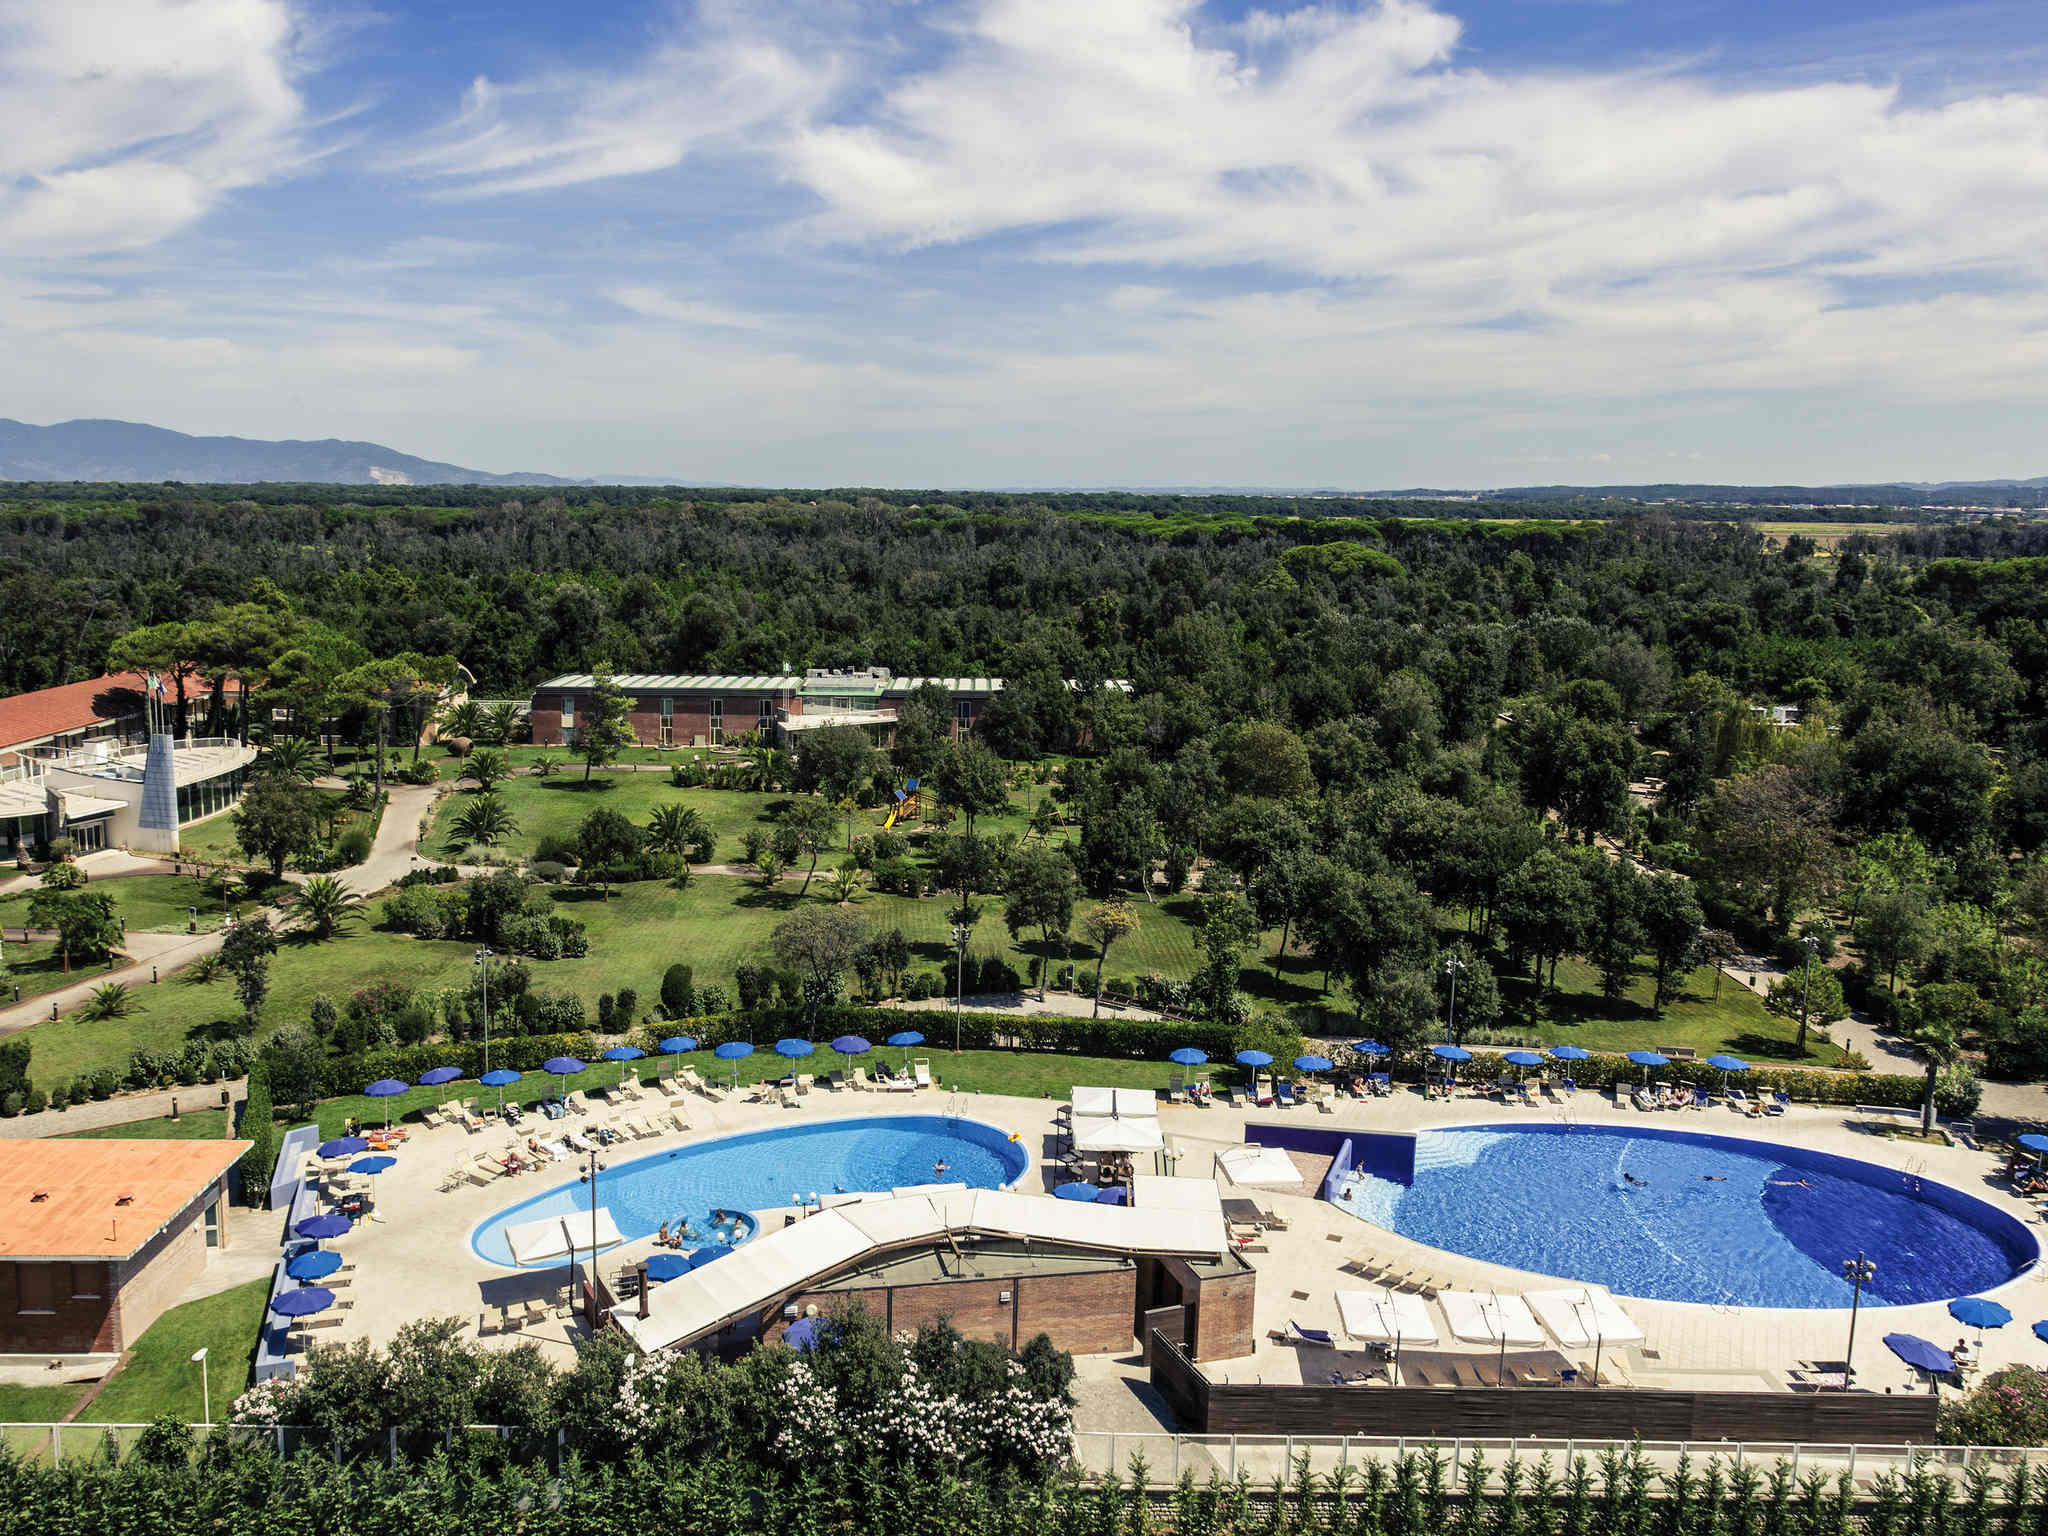 Hotel – Hotel Mercure Tirrenia Green Park - New Opening